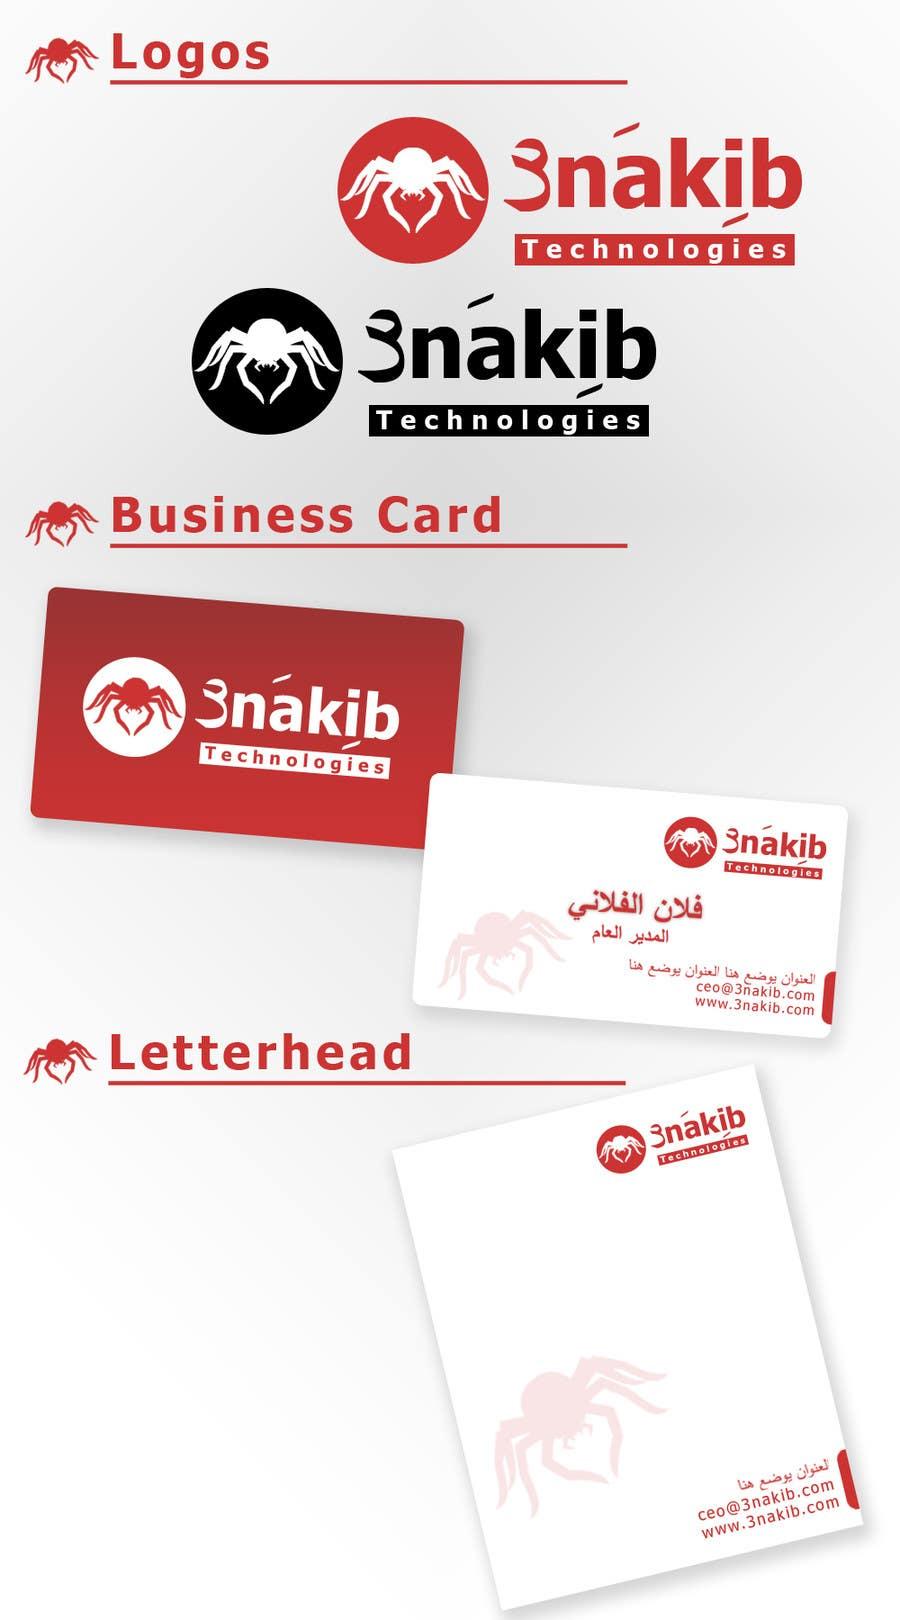 Kilpailutyö #39 kilpailussa Develop a Corporate Identity for 3nkaib Technologies (Spiders)